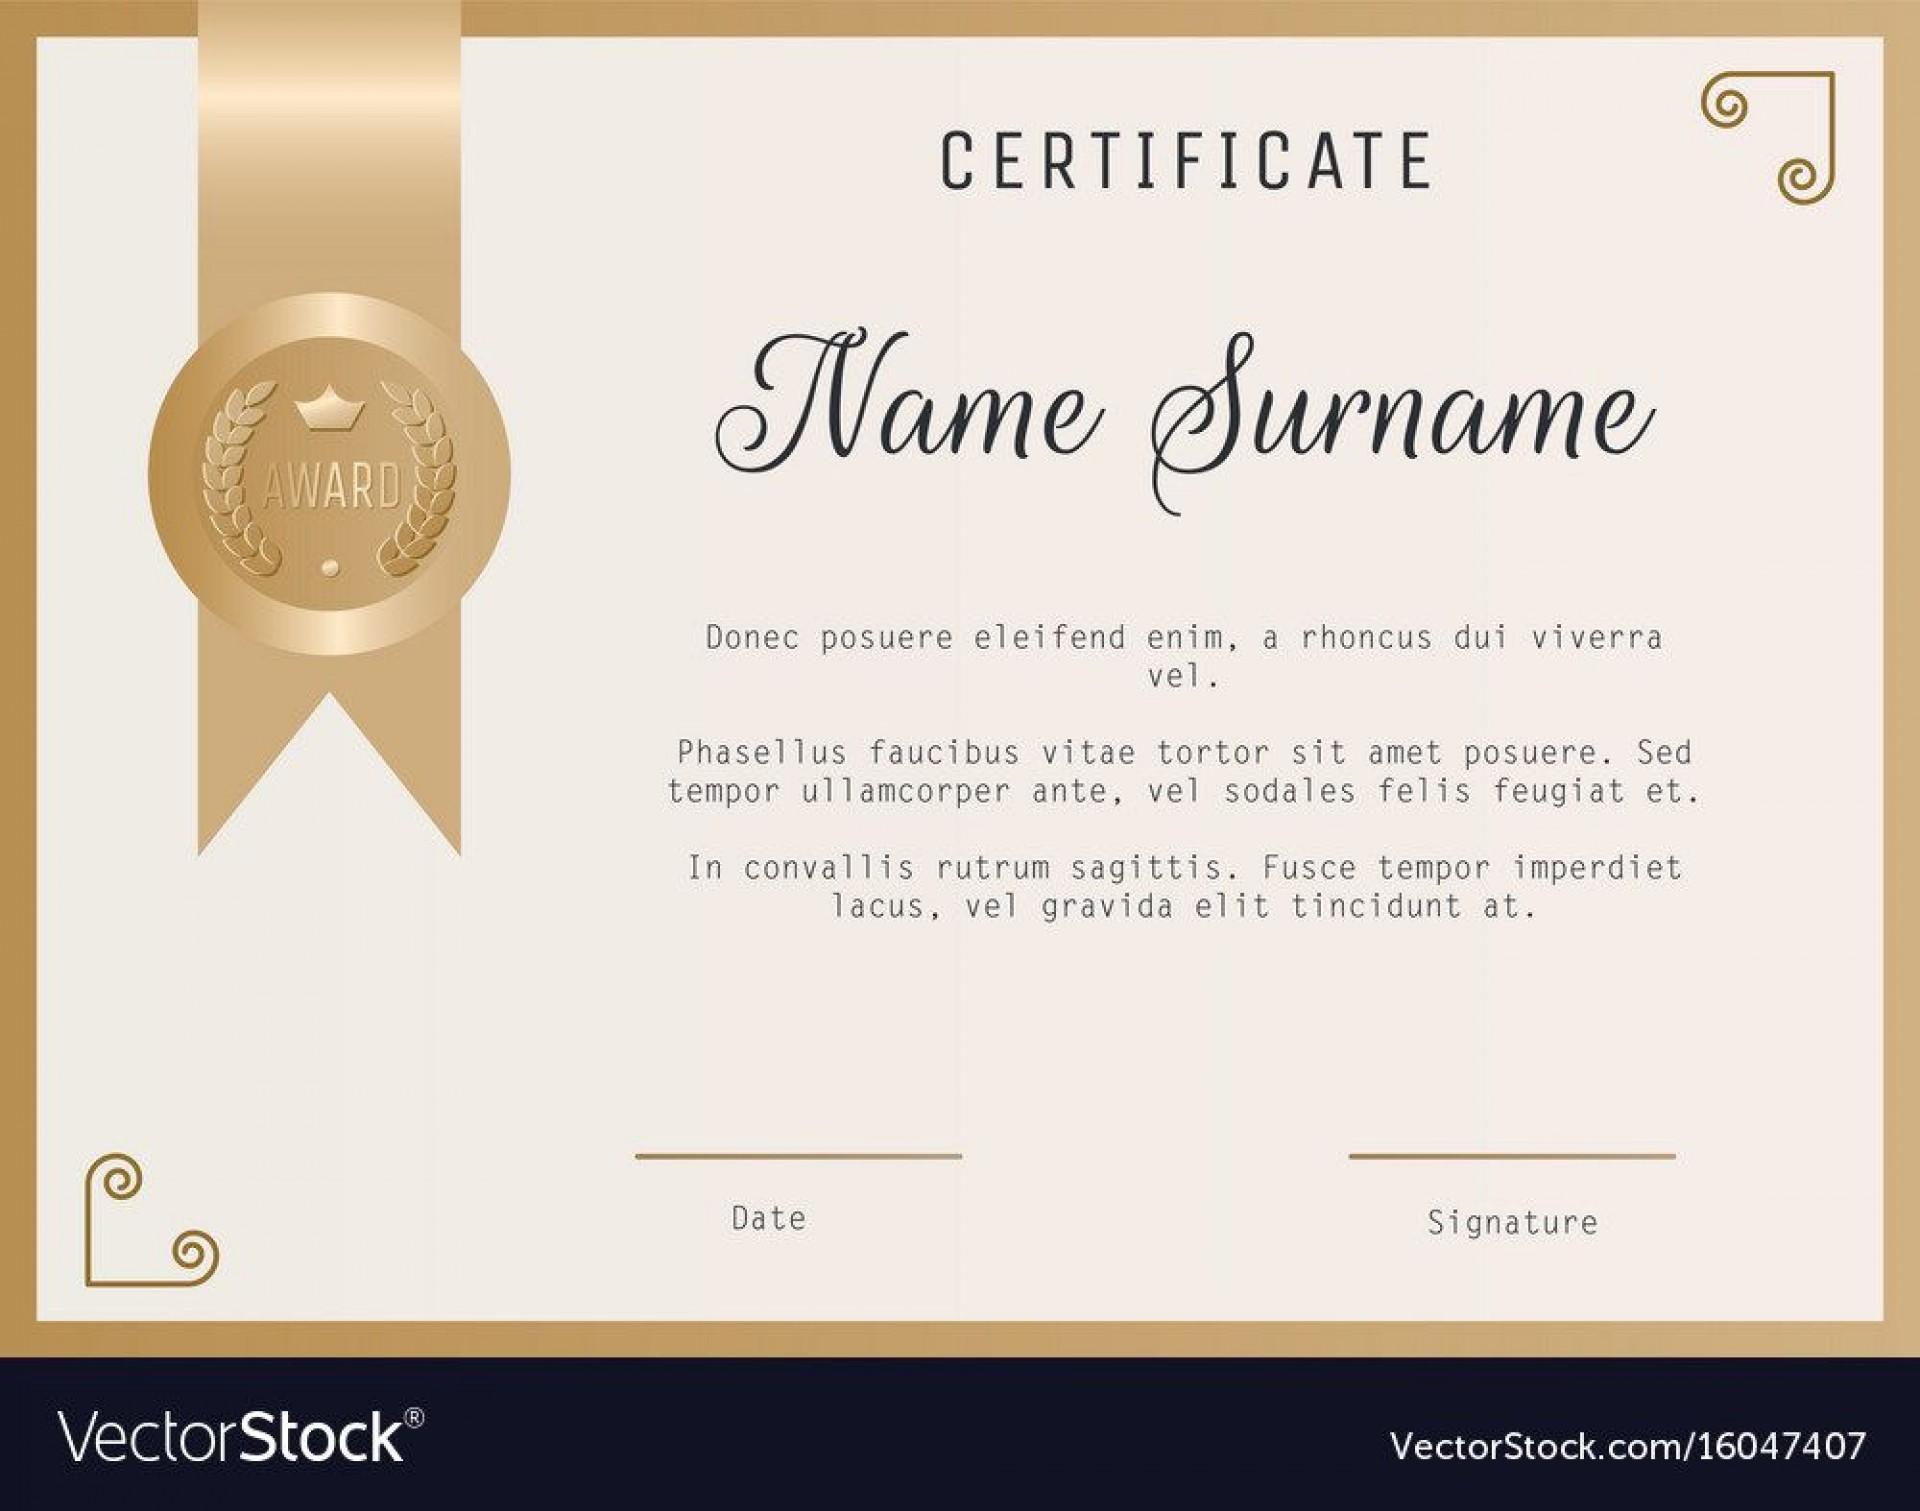 005 Unbelievable Blank Award Certificate Template Sample  Printable Math Editable Free1920